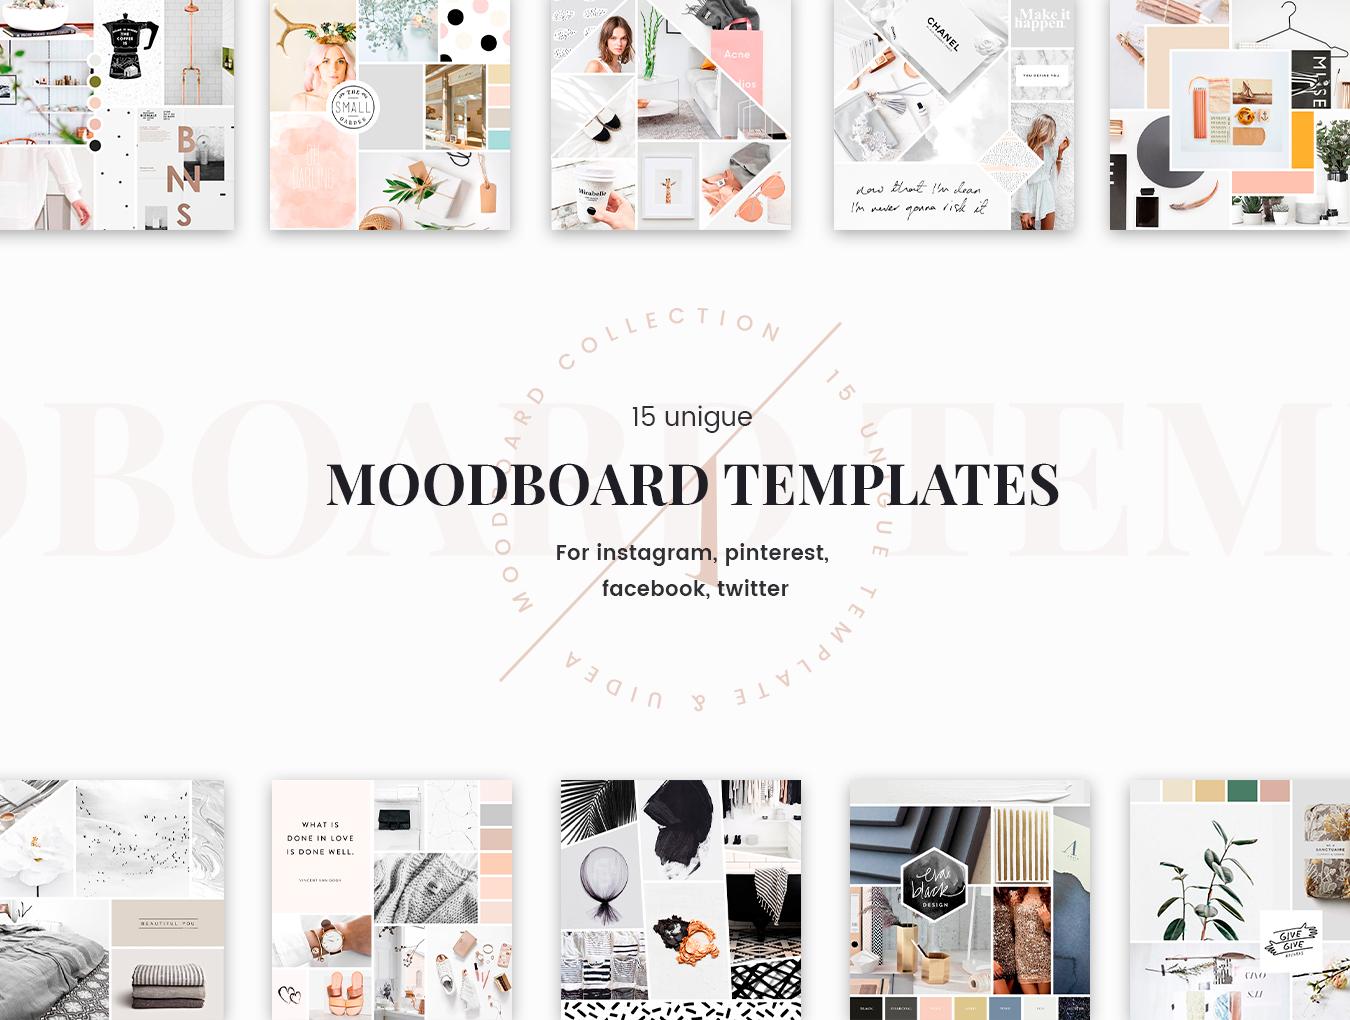 [VIP专享]Uidea MoodBoard 15个独特的可定制社交媒体图片模板.psd素材下载 VIP界面-第6张